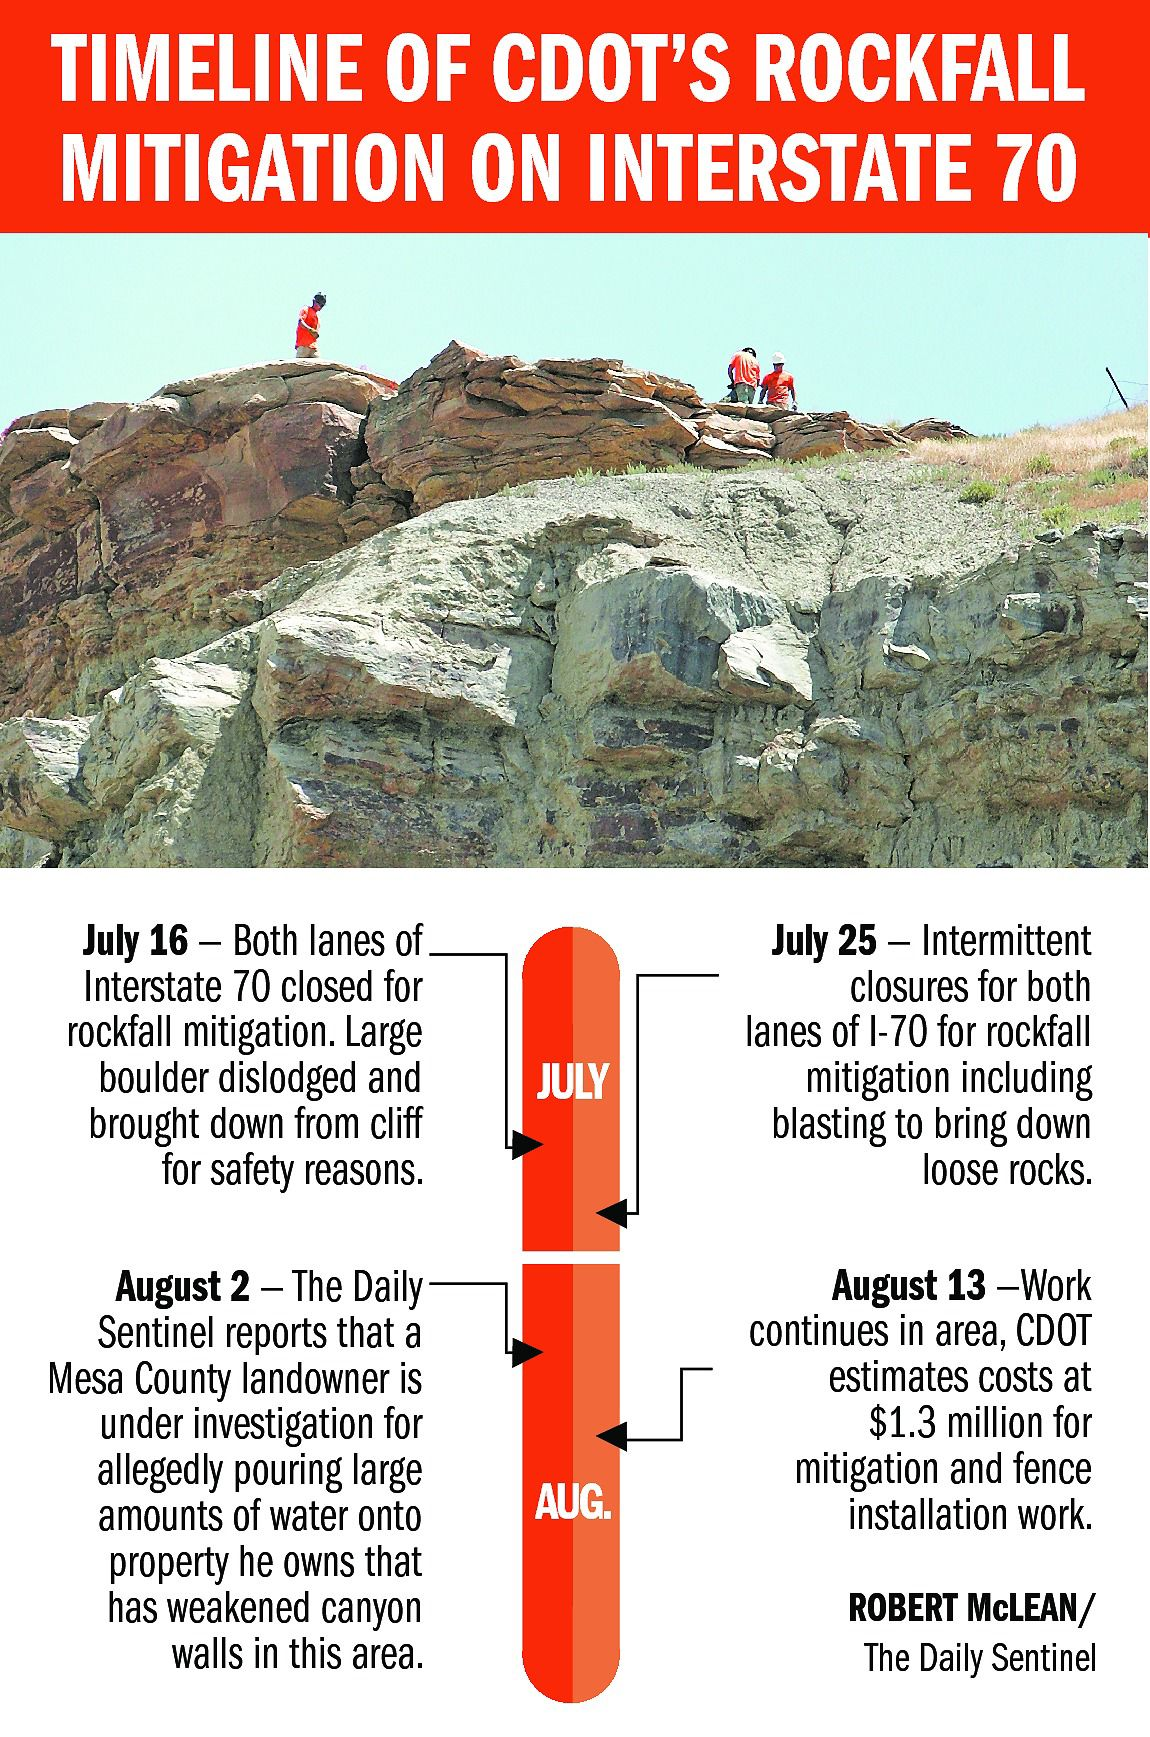 Rock work costs $1.3M